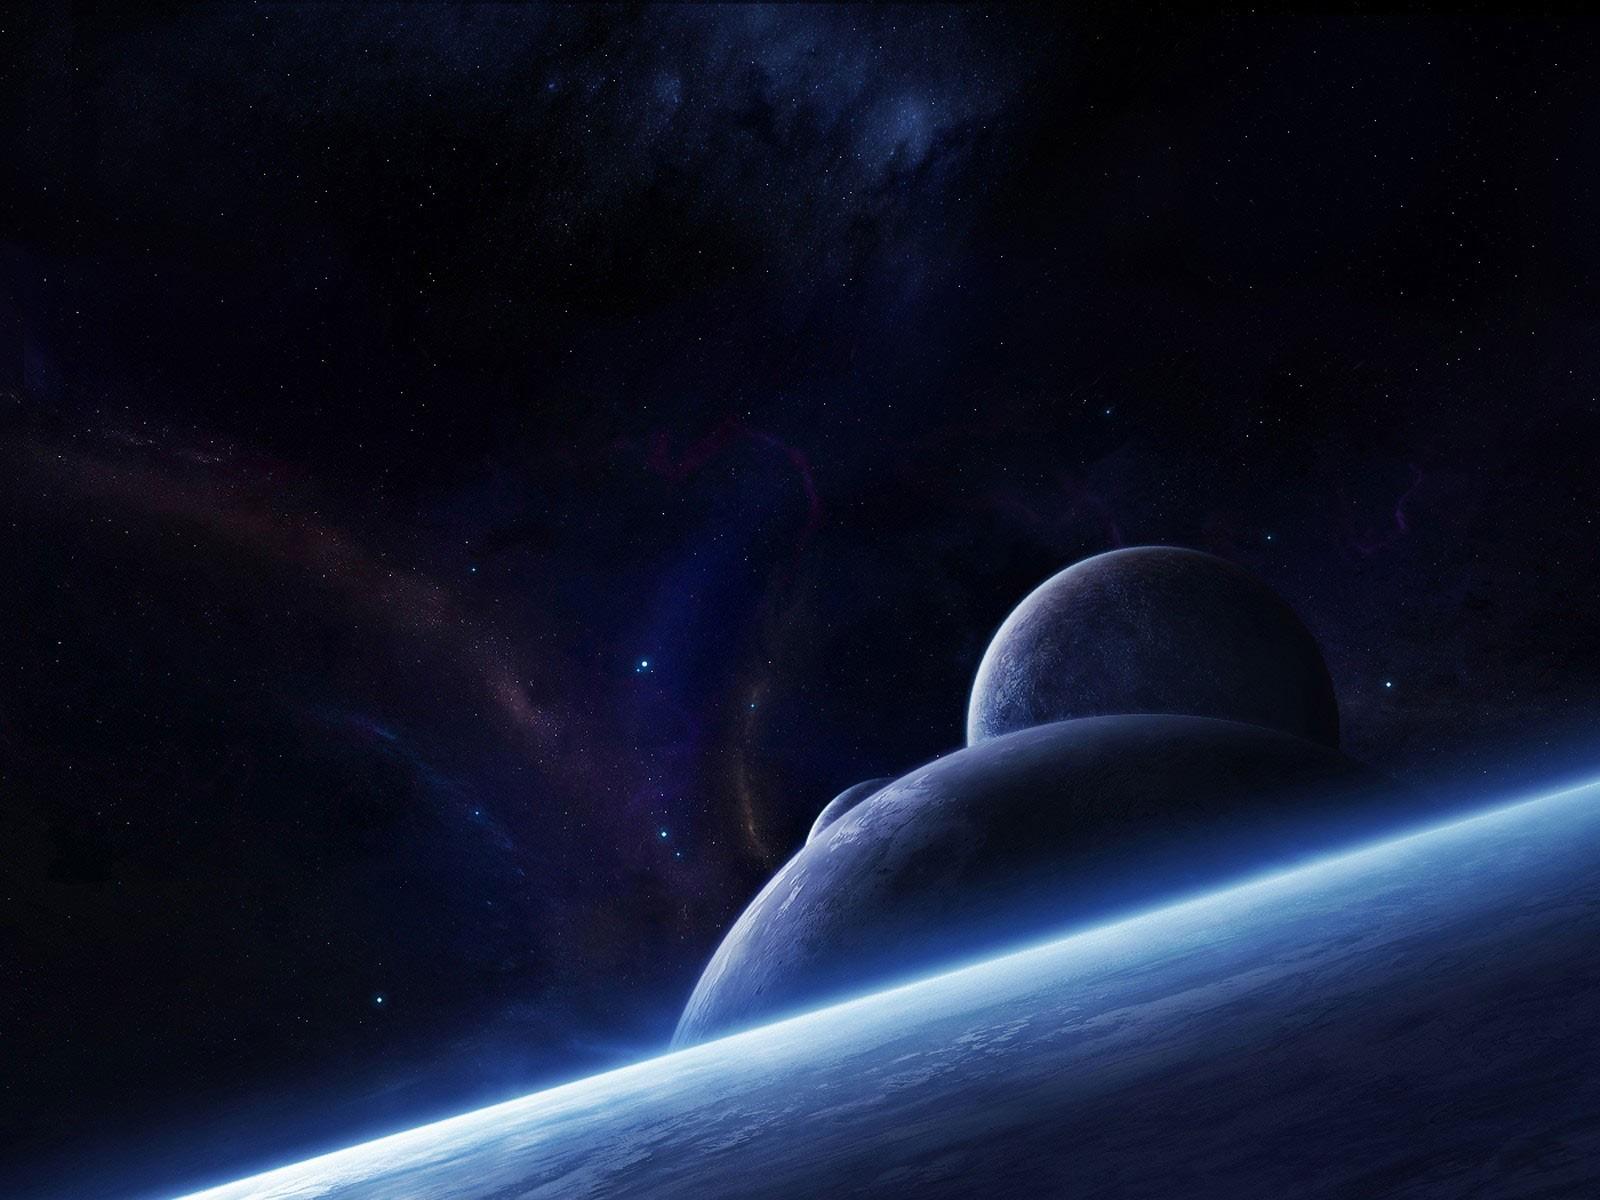 General 1600x1200 space planet space art digital art